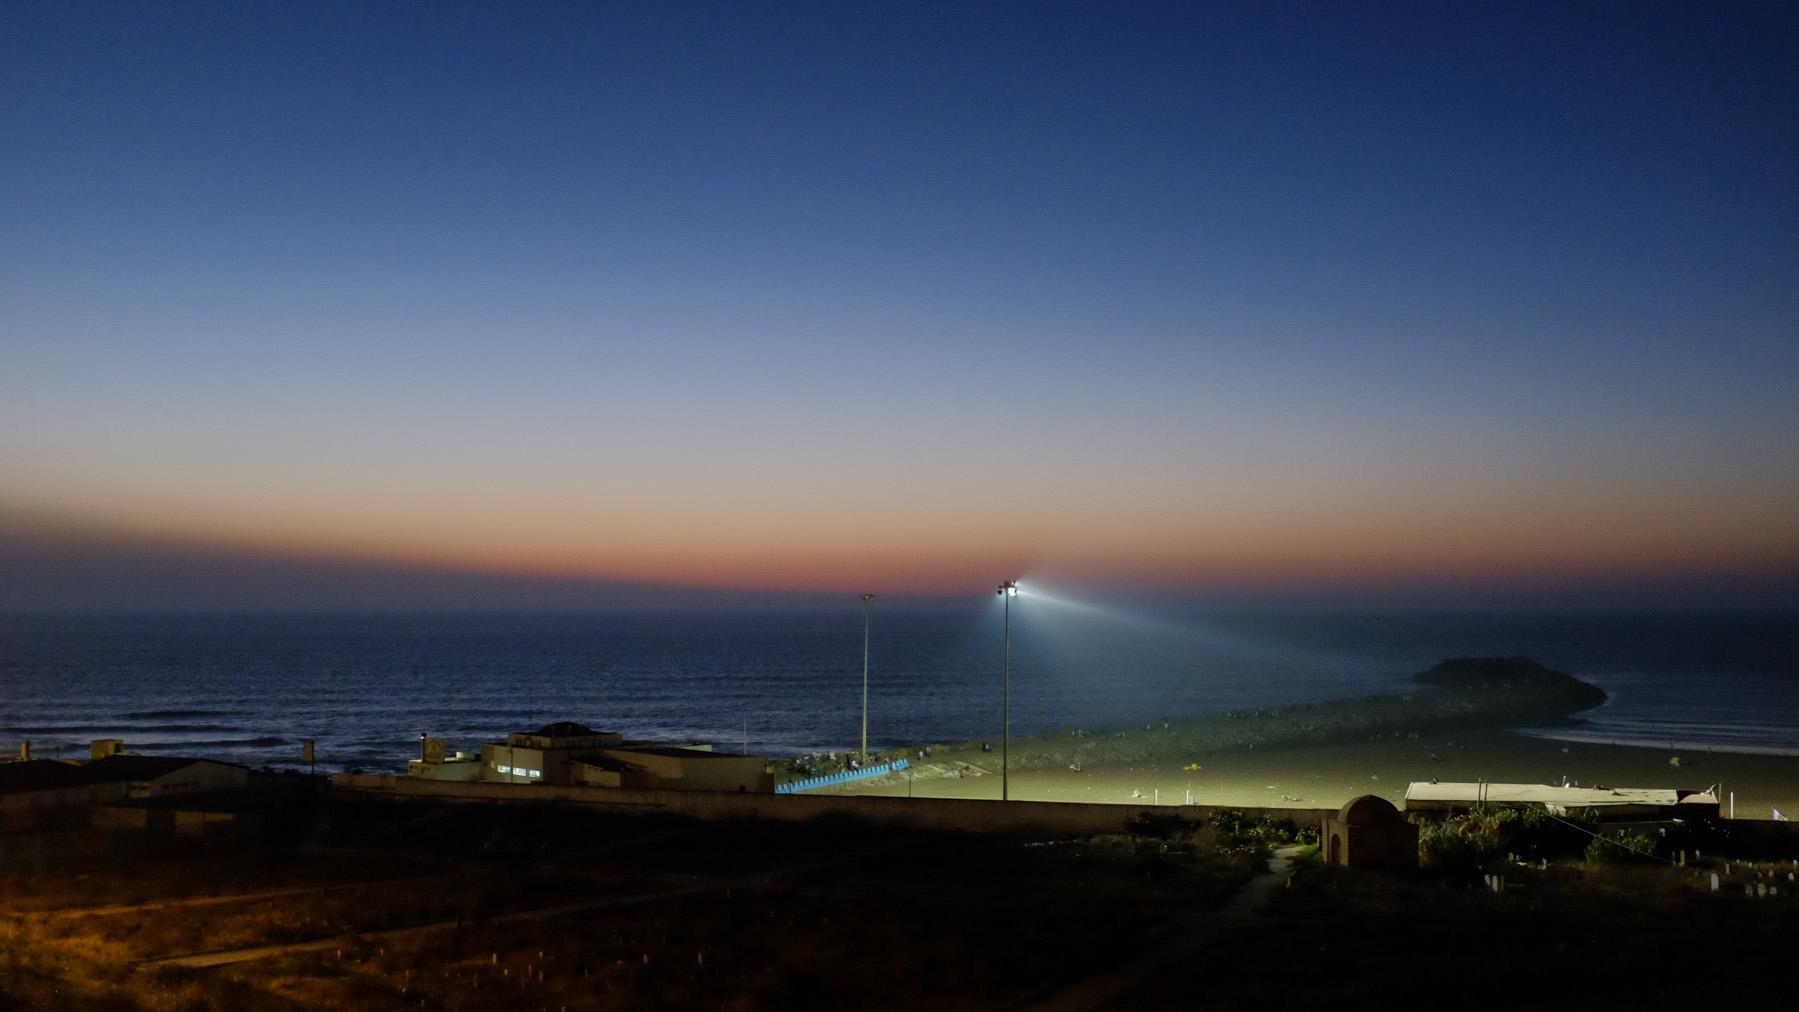 201307 Rabat 031.jpg